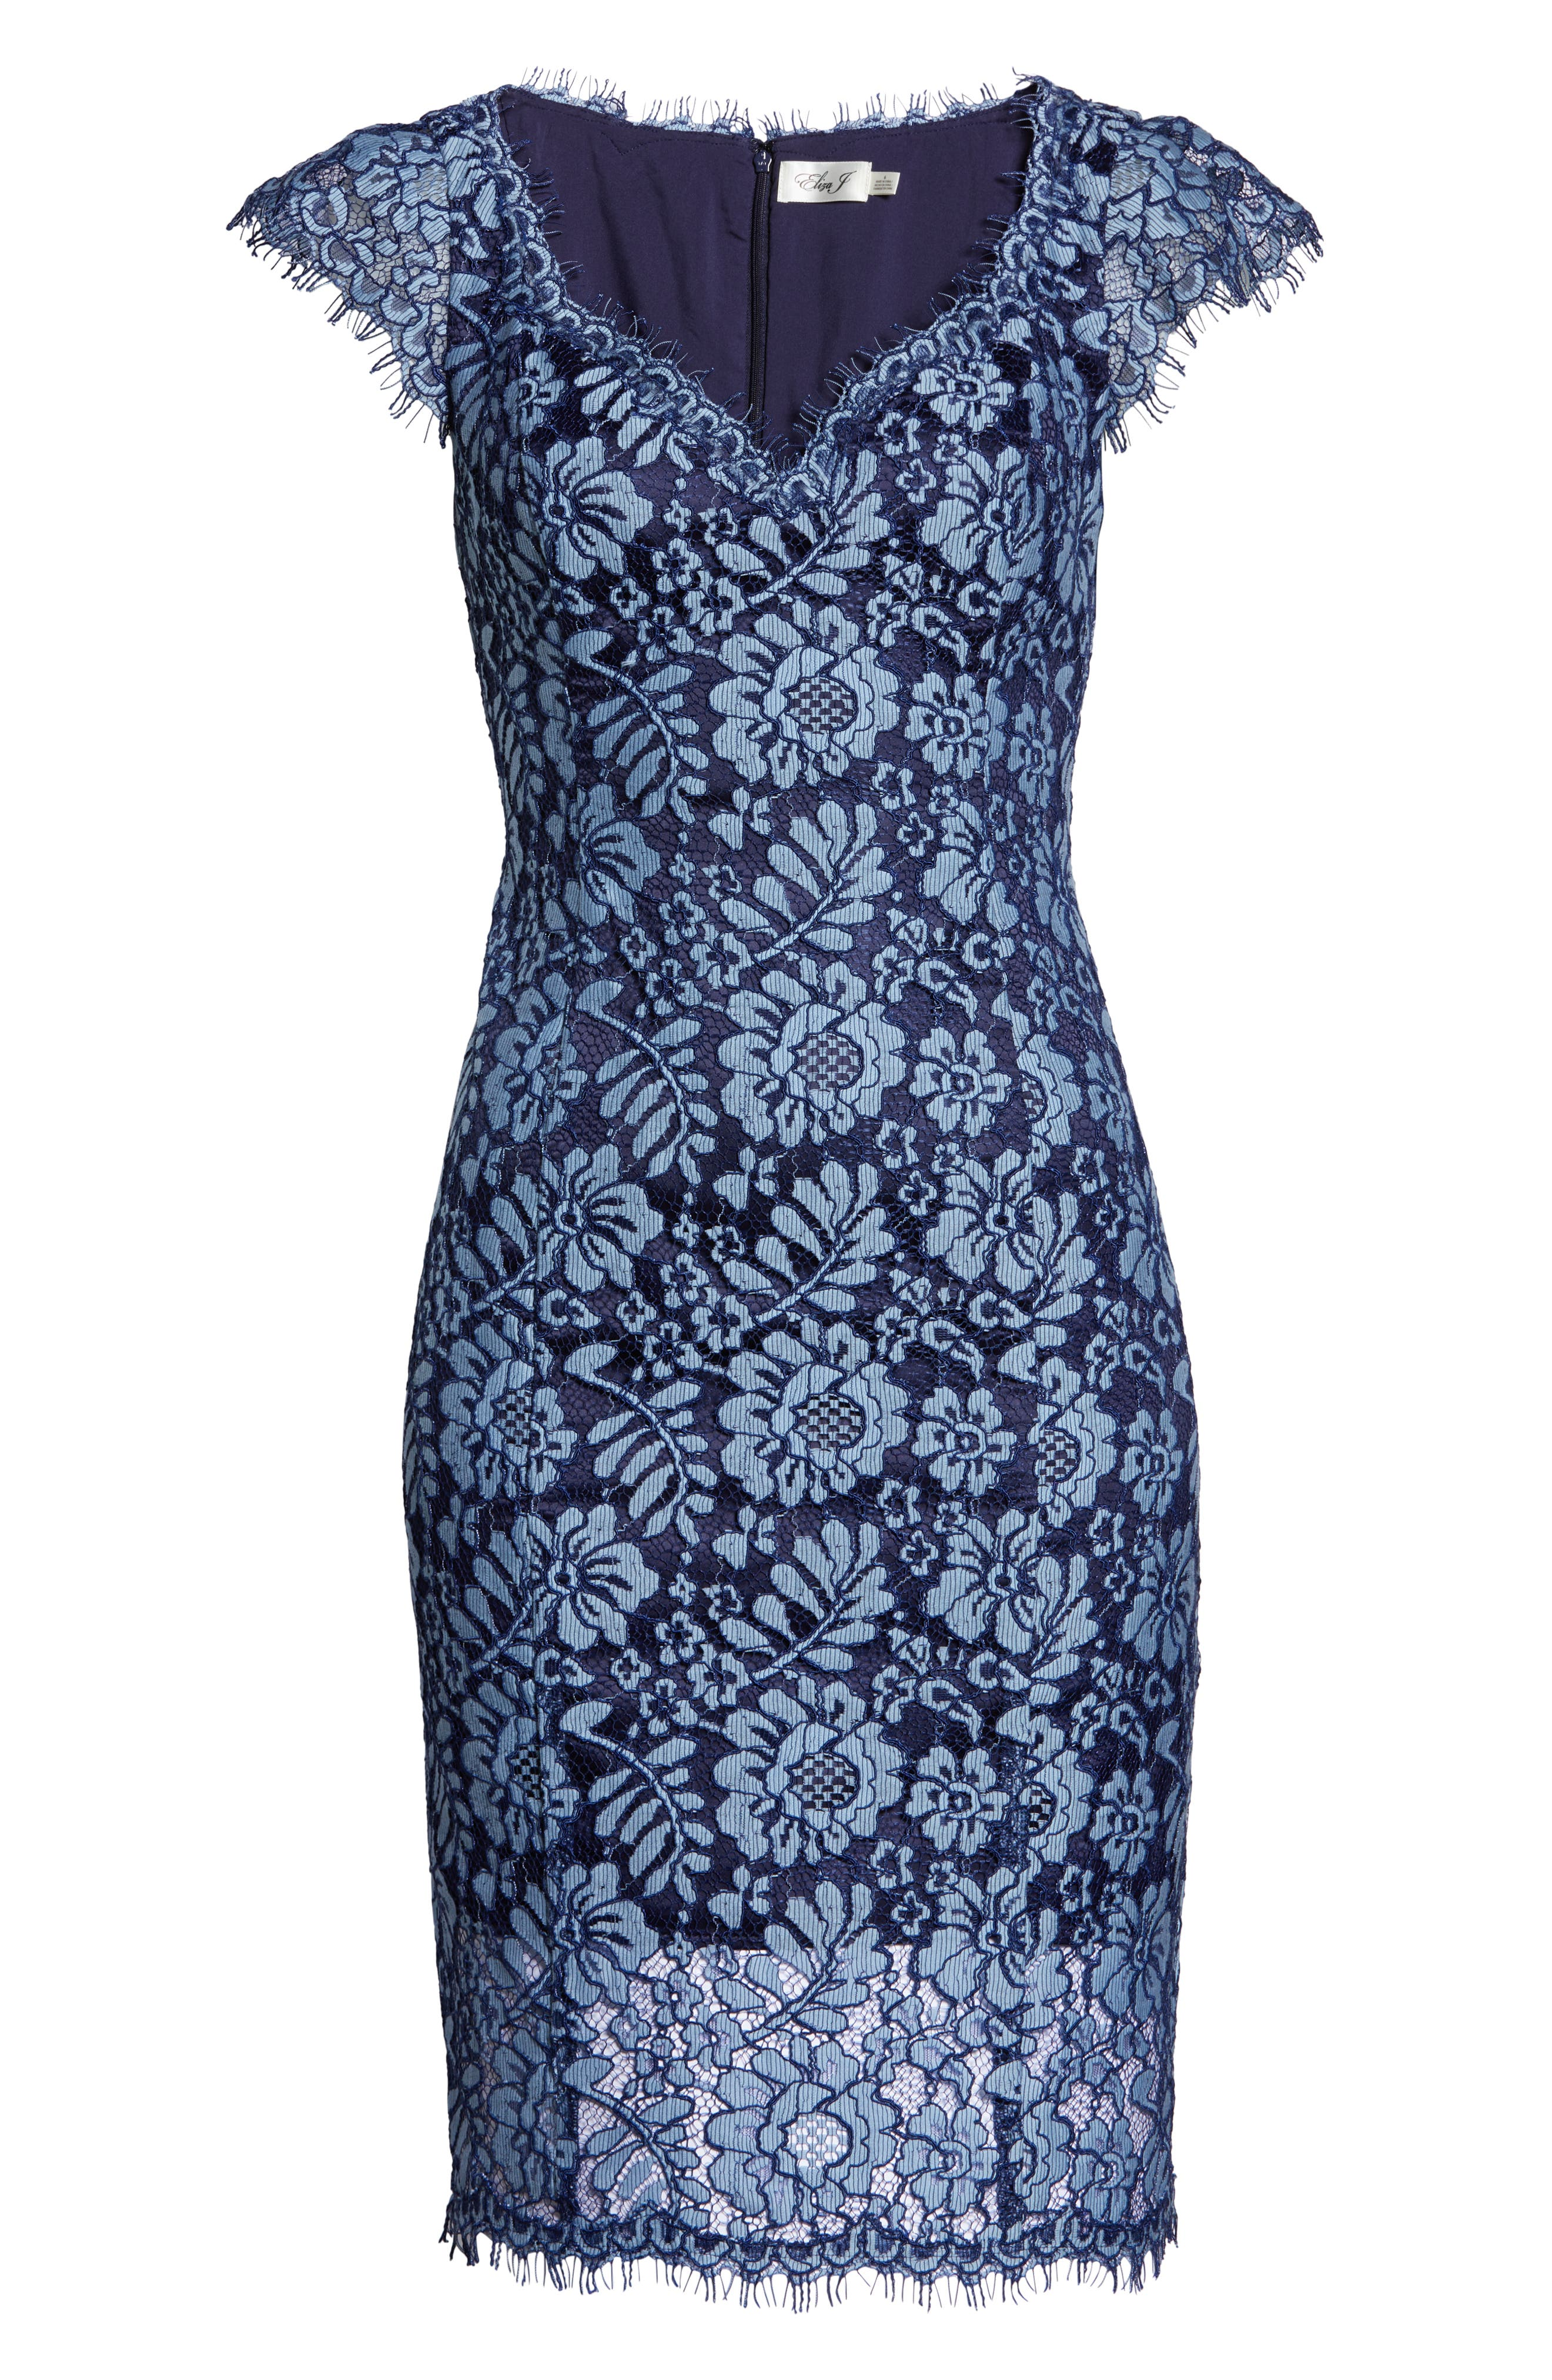 ELIZA J,                             Floral Lace Sheath Dress,                             Alternate thumbnail 7, color,                             NAVY